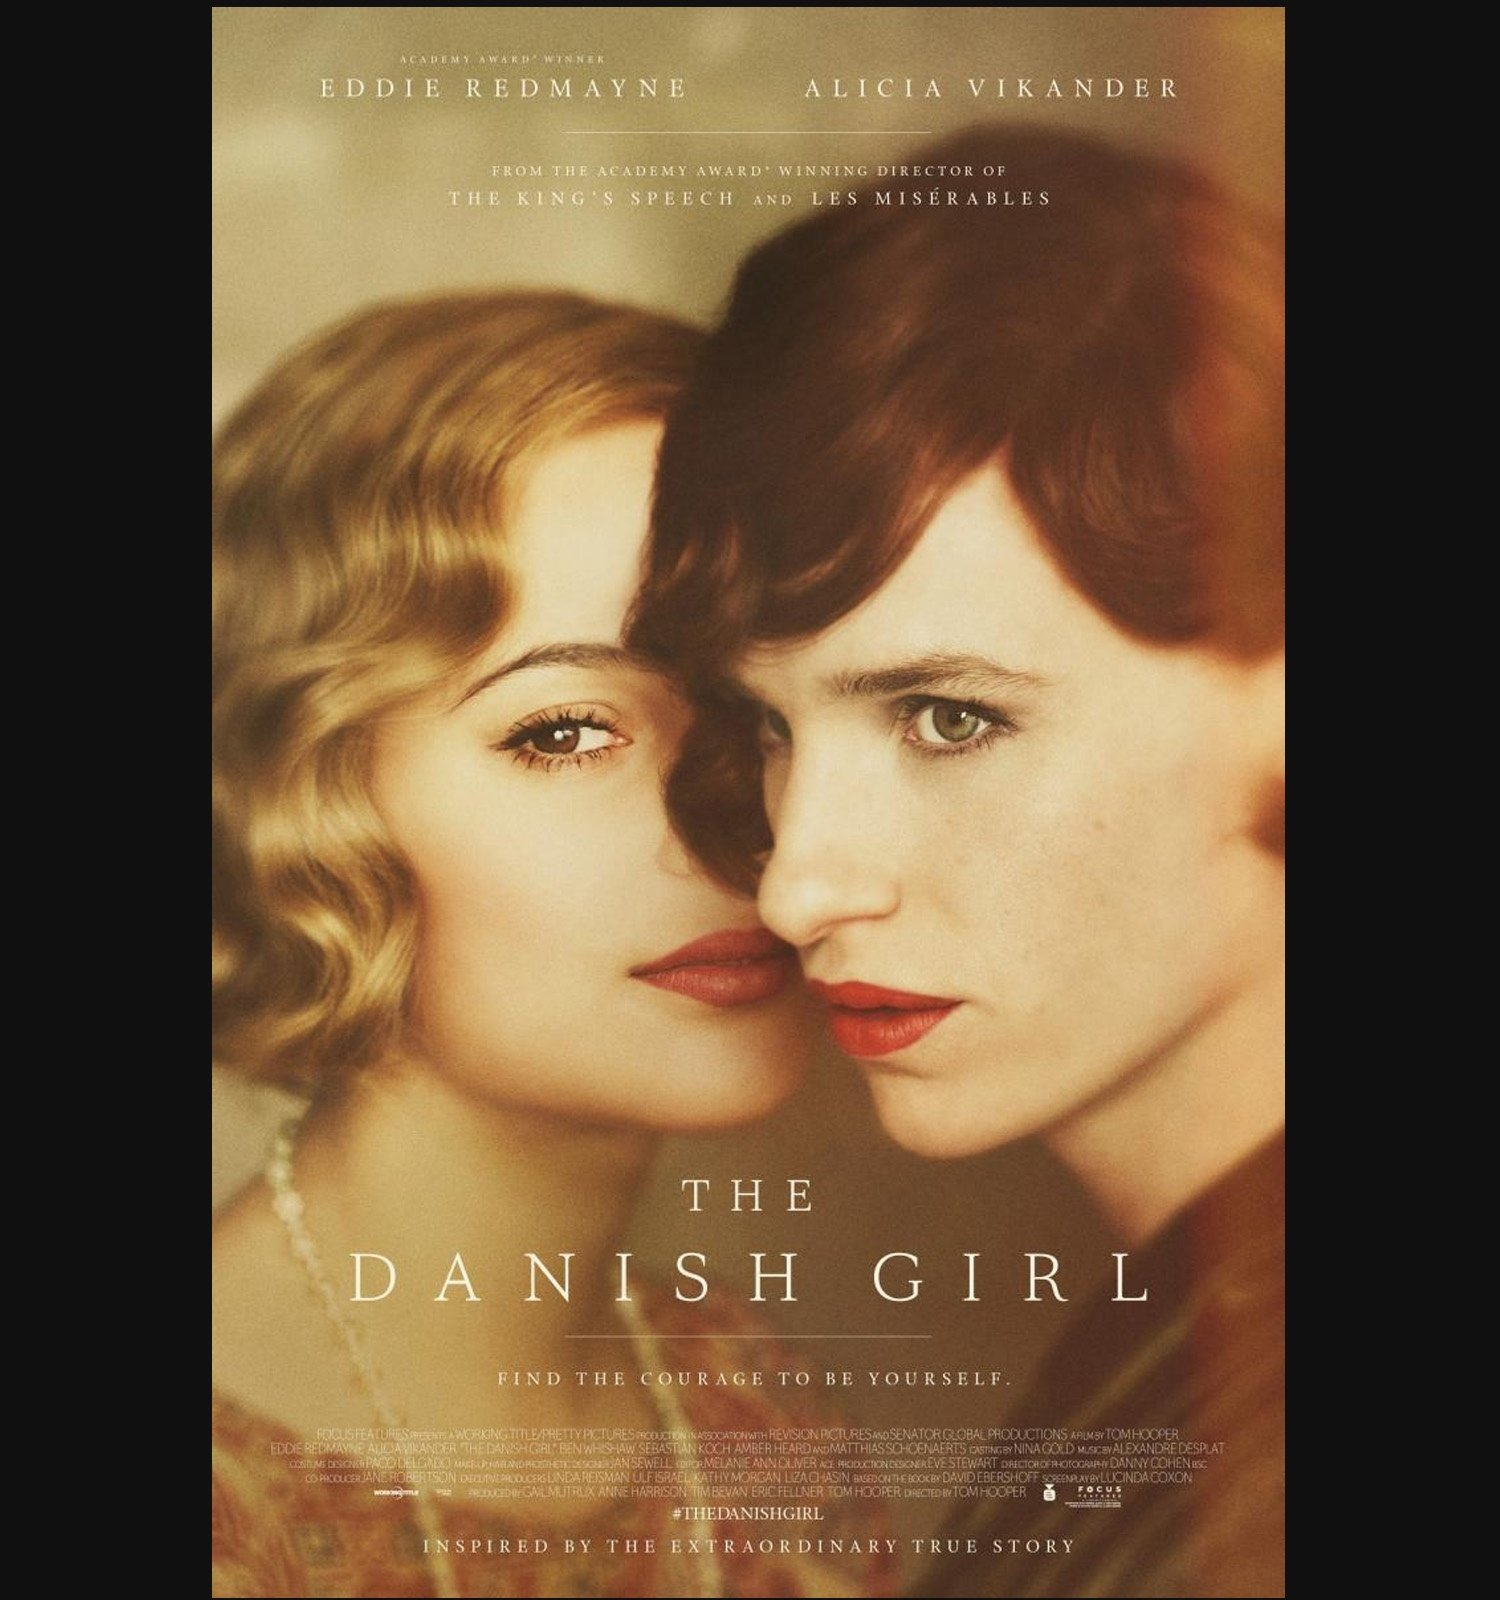 Cartel de la película The Danish Girl